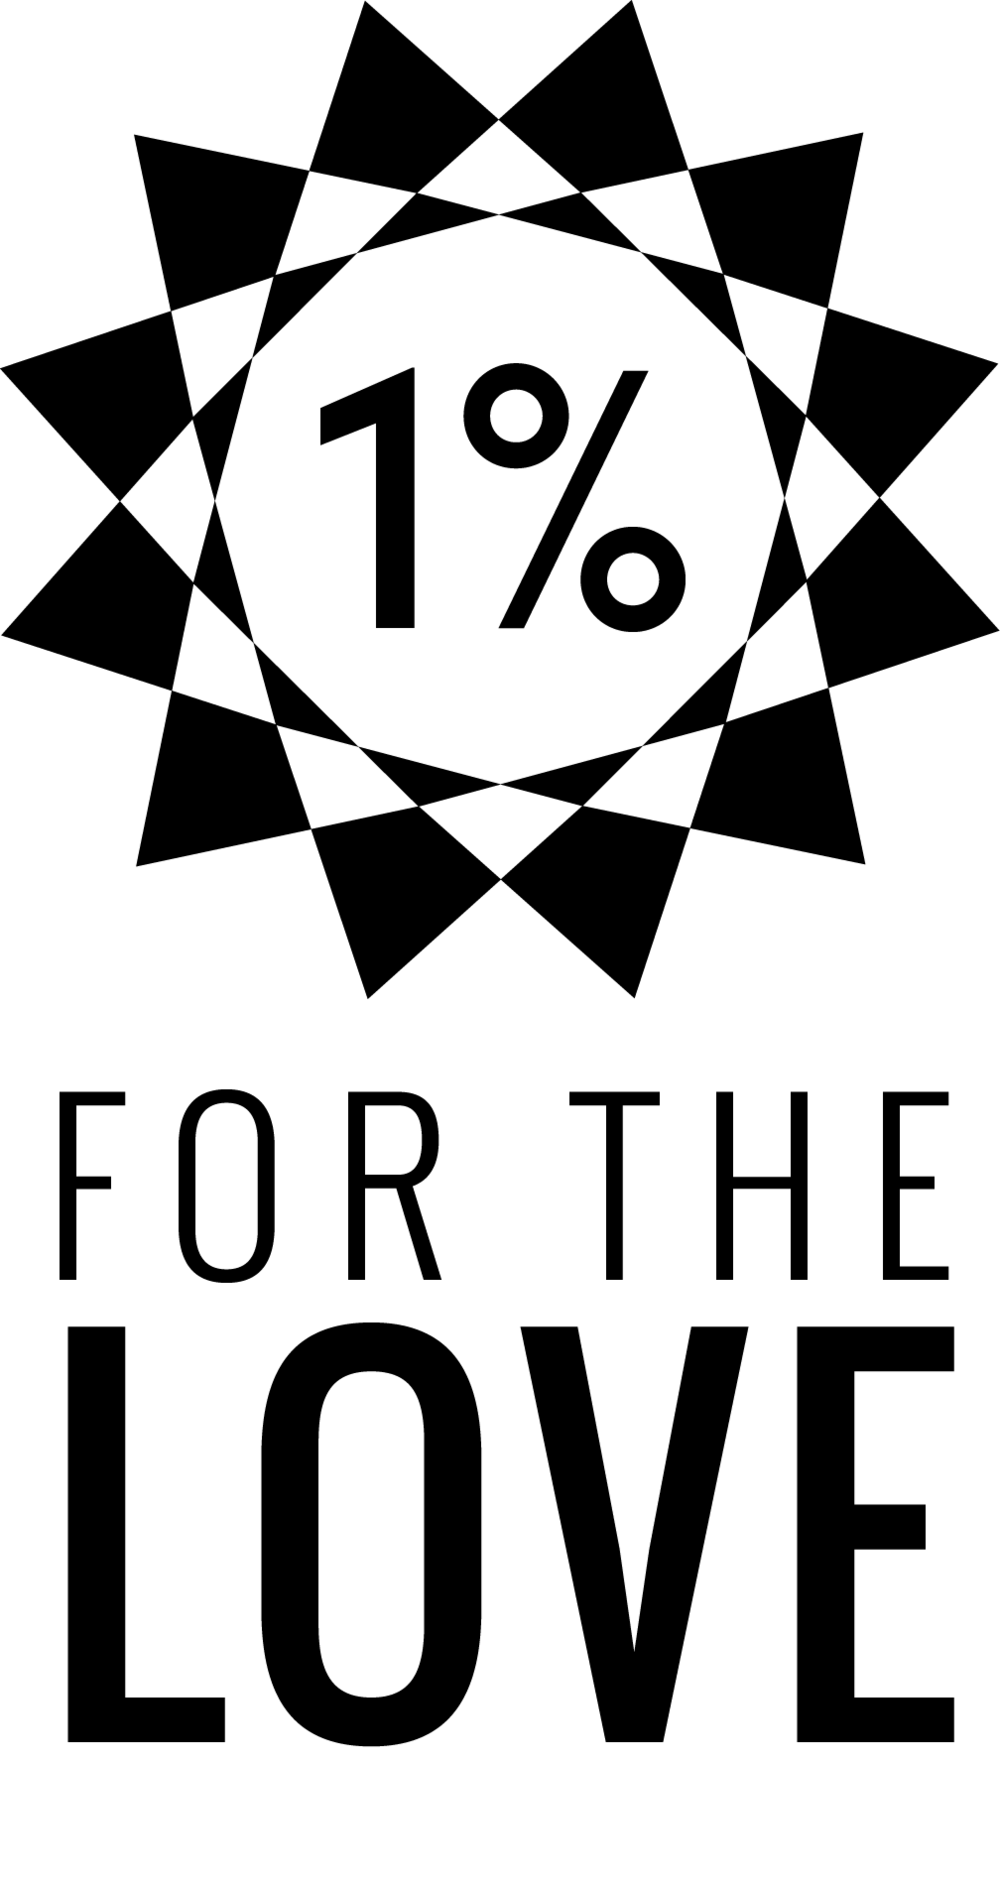 18-0718_LWL-OnePercent.png